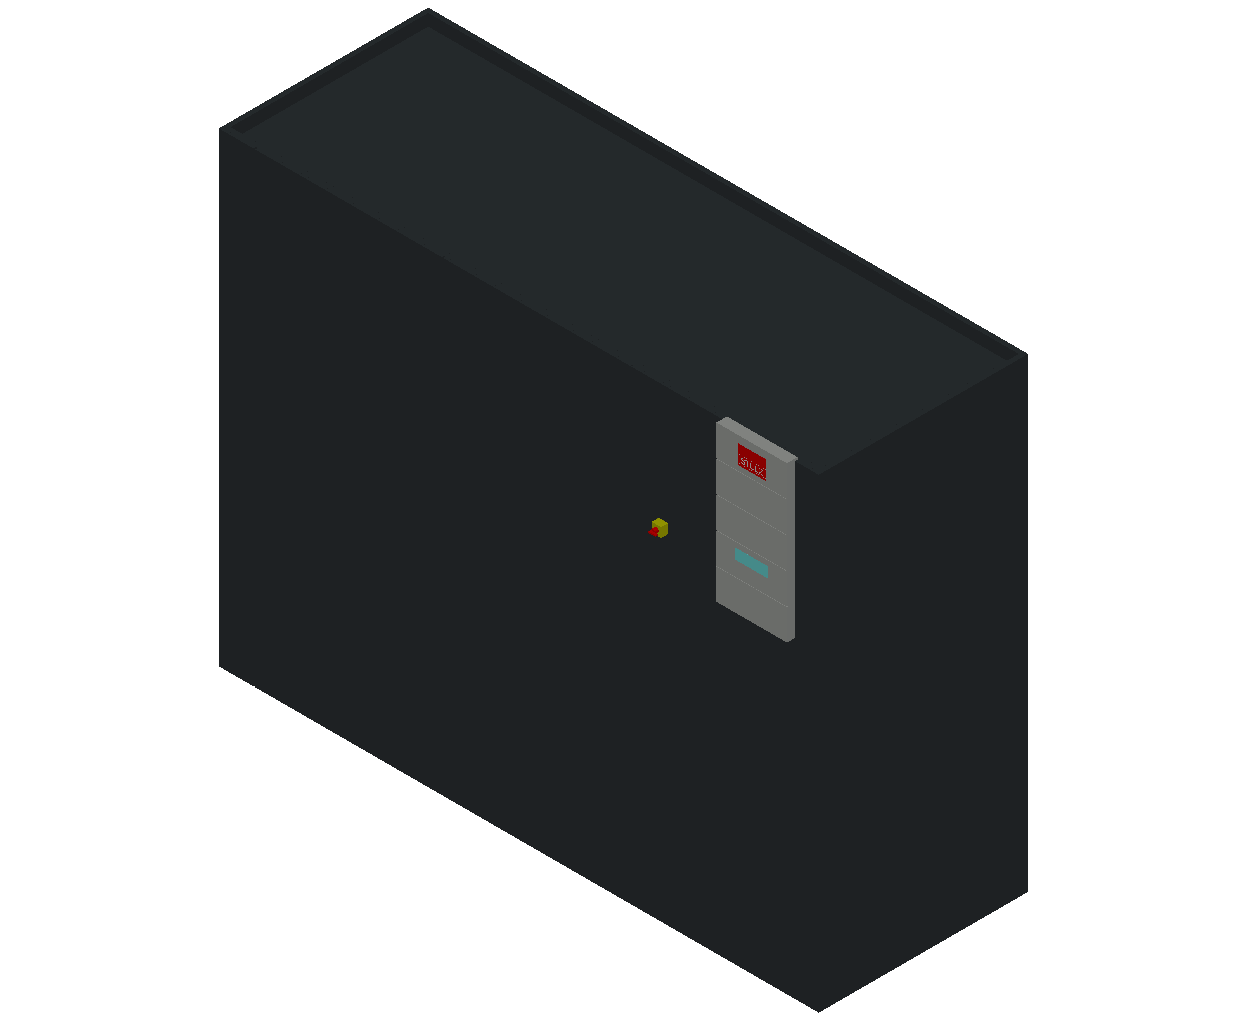 HC_Air Conditioner_Indoor Unit_MEPcontent_STULZ_CyberAir 3PRO_ALD_Dual Circuit GES_ALD_882_GES_INT-EN.dwg